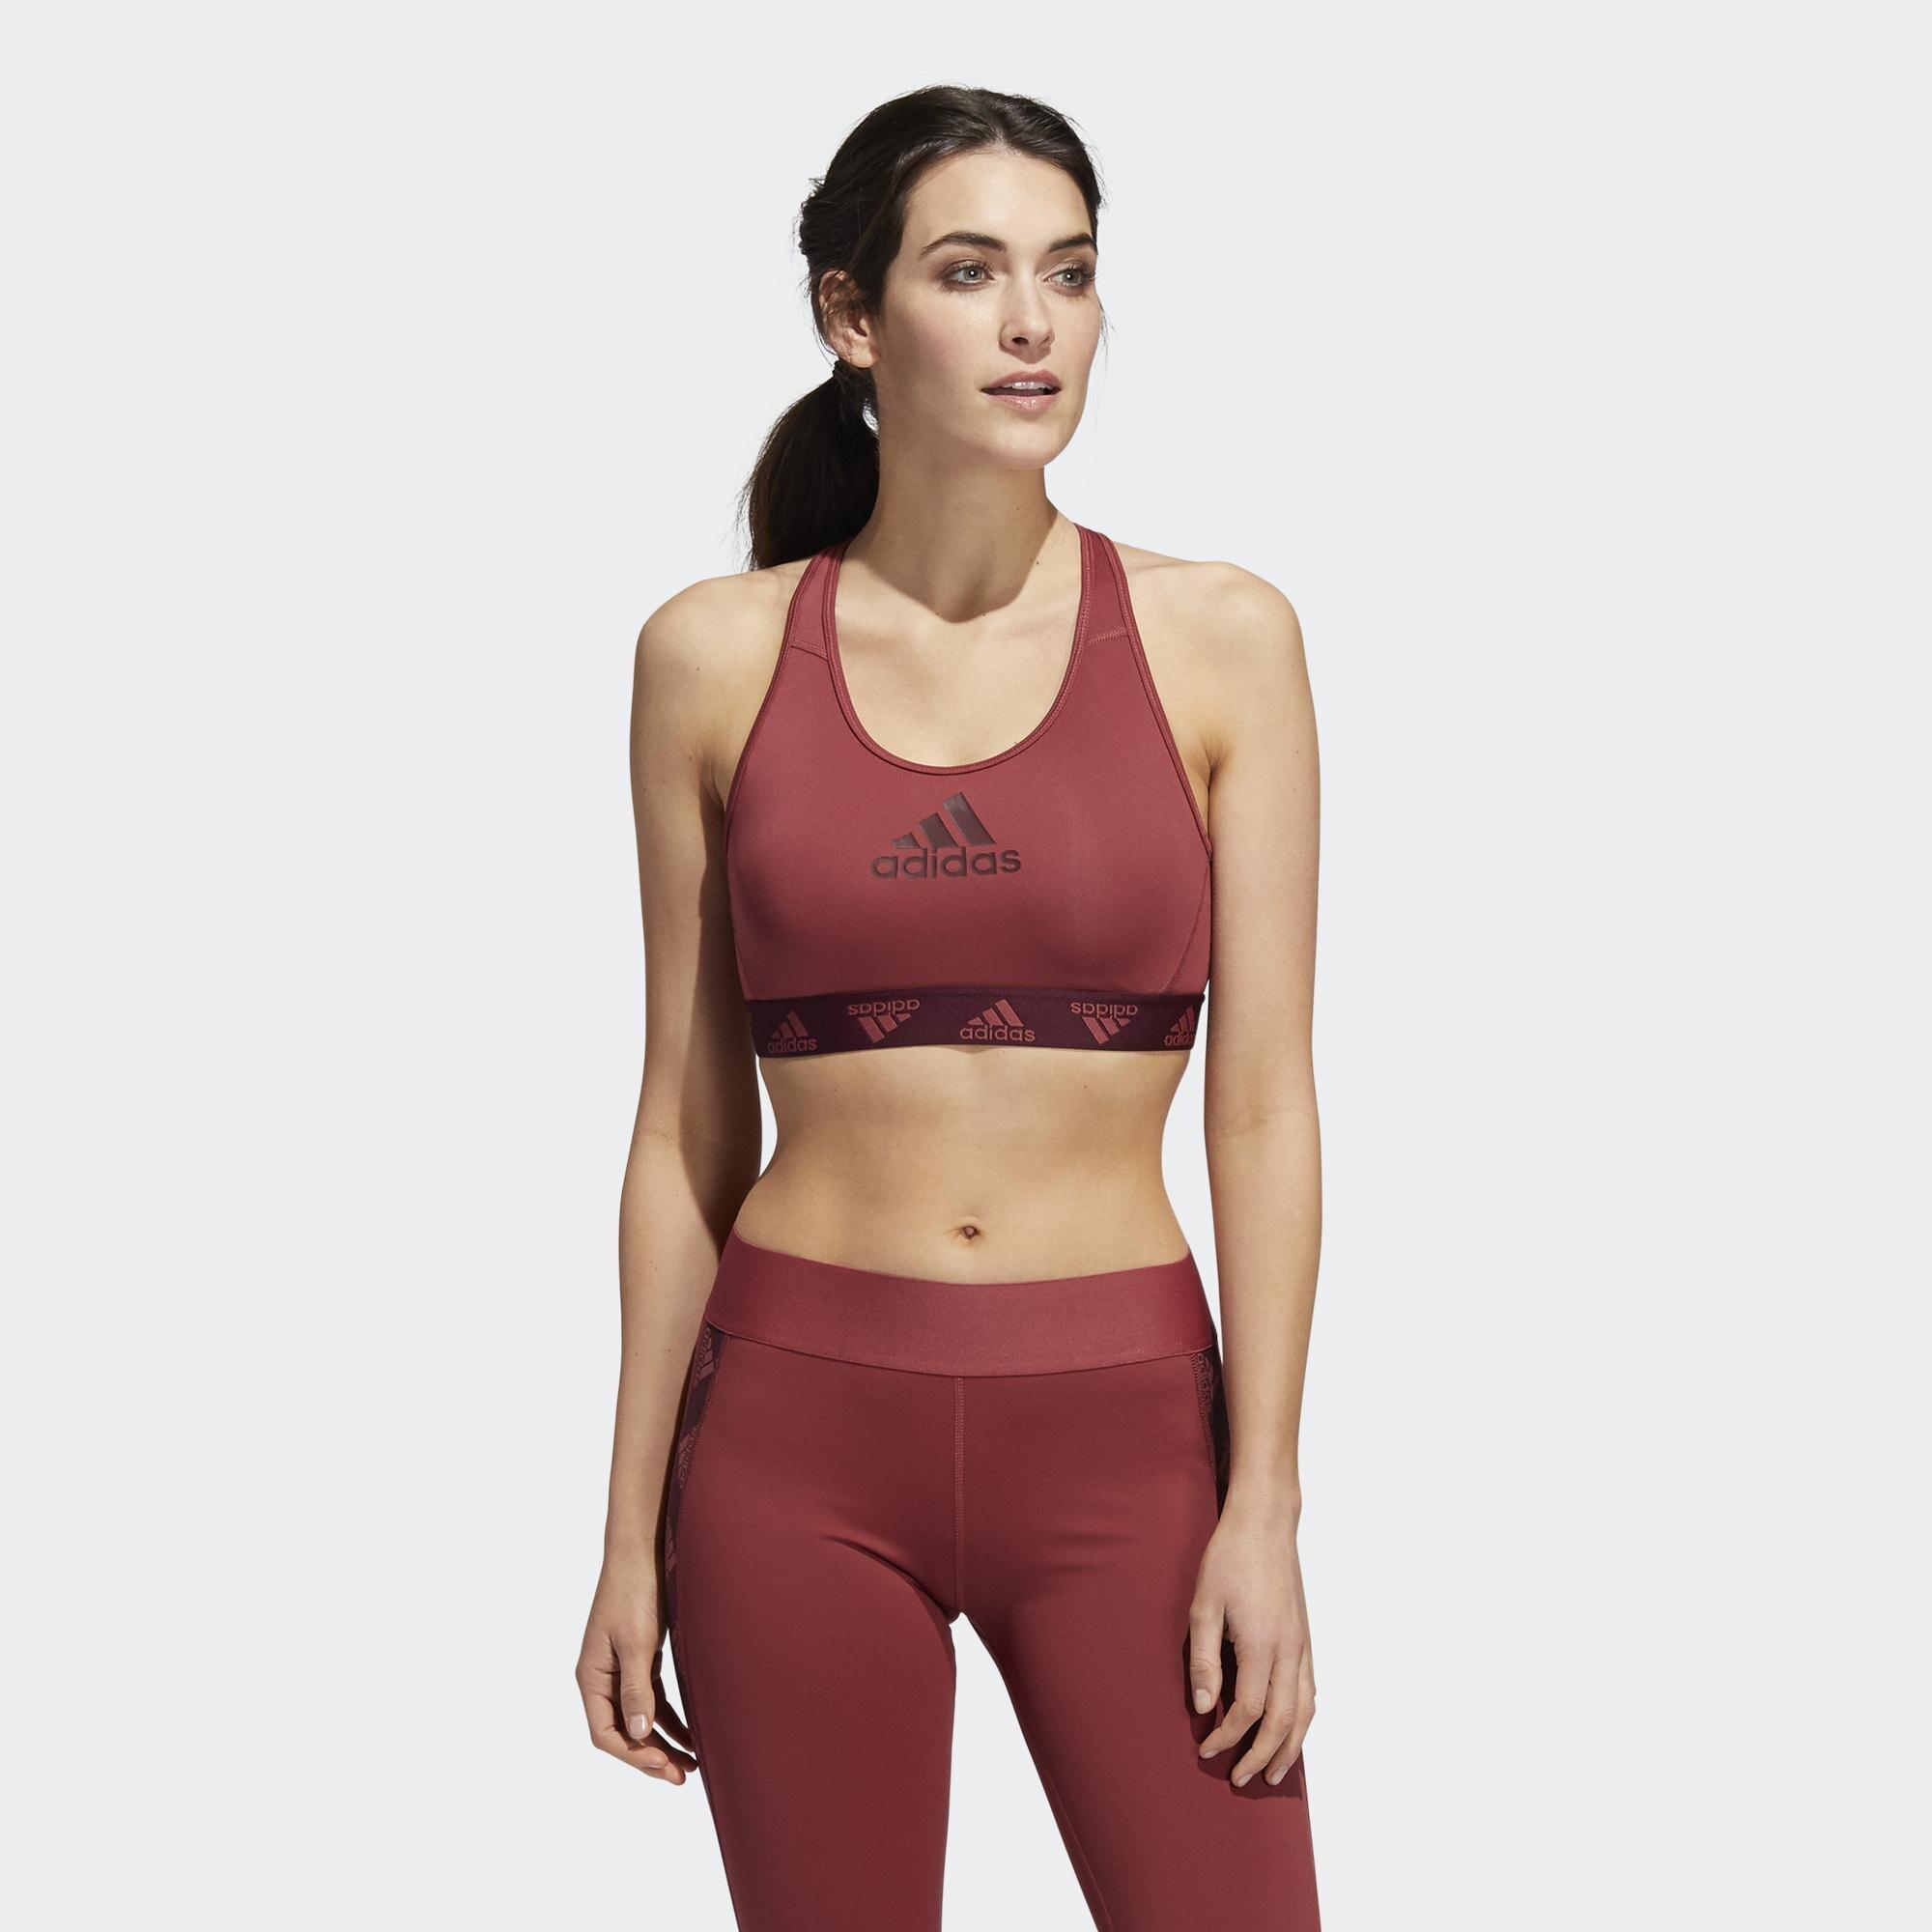 Adidas LOGO 女裝 運動內衣 慢跑 訓練 可拆卸式襯墊 中度支撐 背面透視 酒紅【運動世界】GC8176